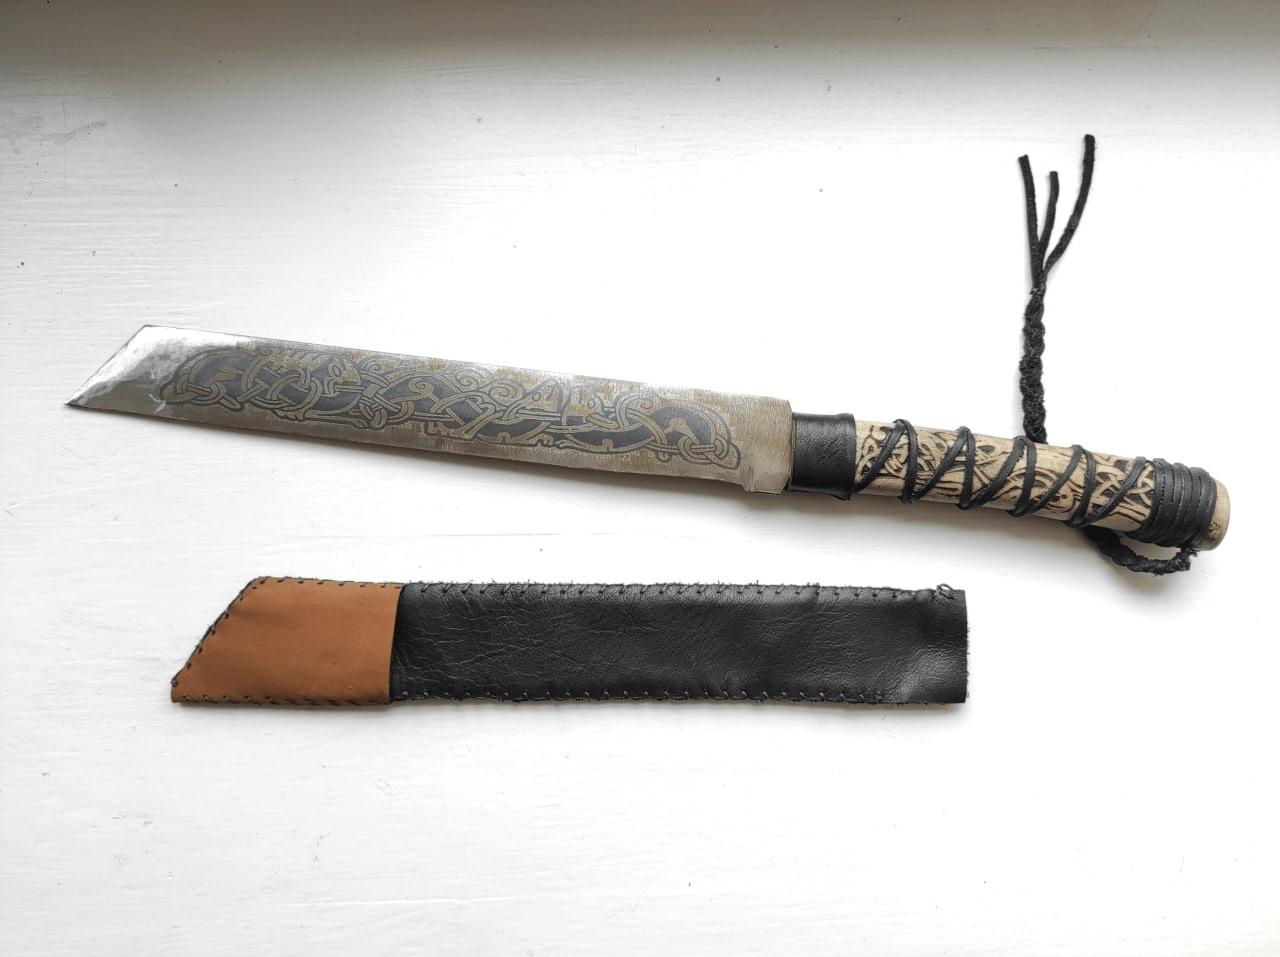 A DIY knife